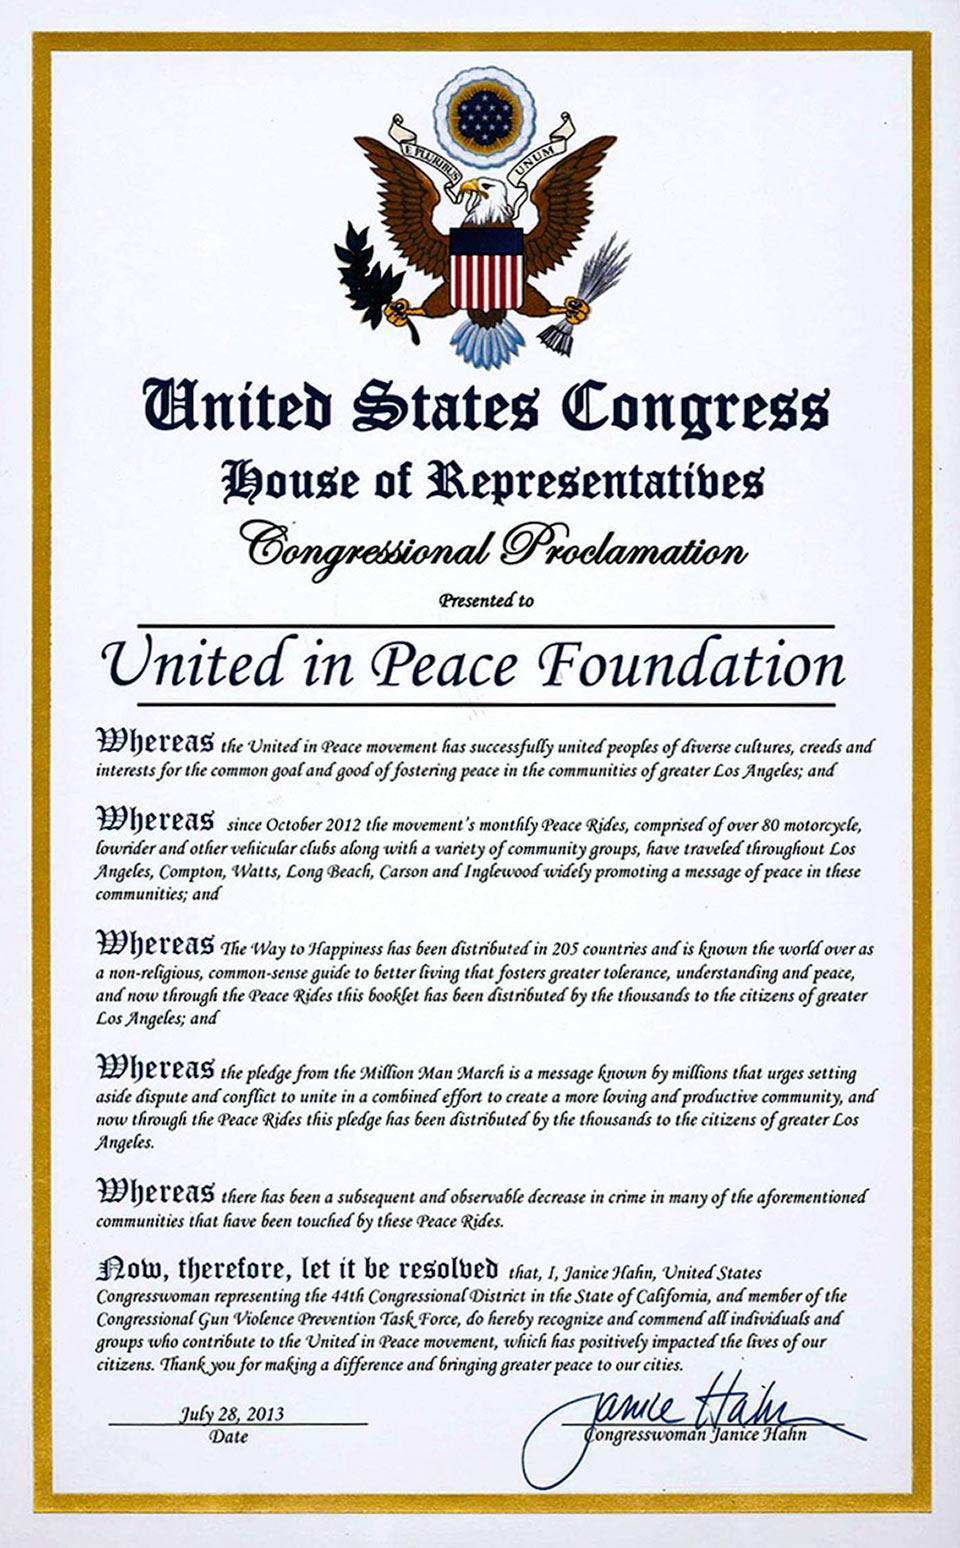 Janice-Hahn-Congress.jpg